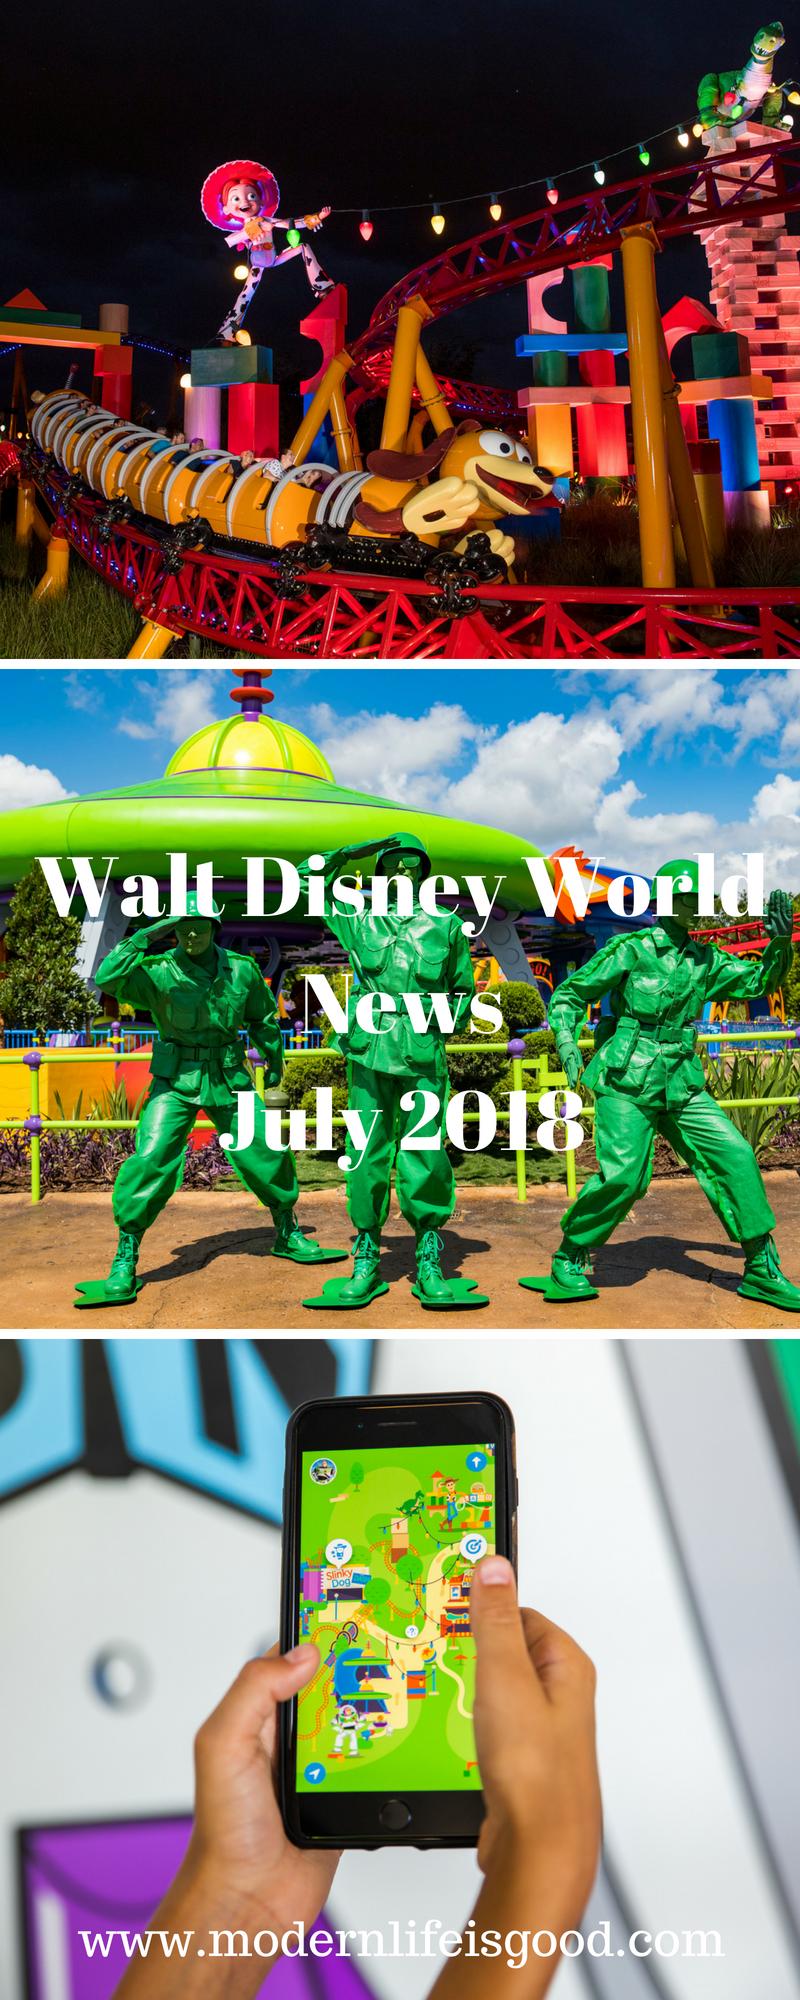 Walt Disney World News July 2018 Disney world news, Walt